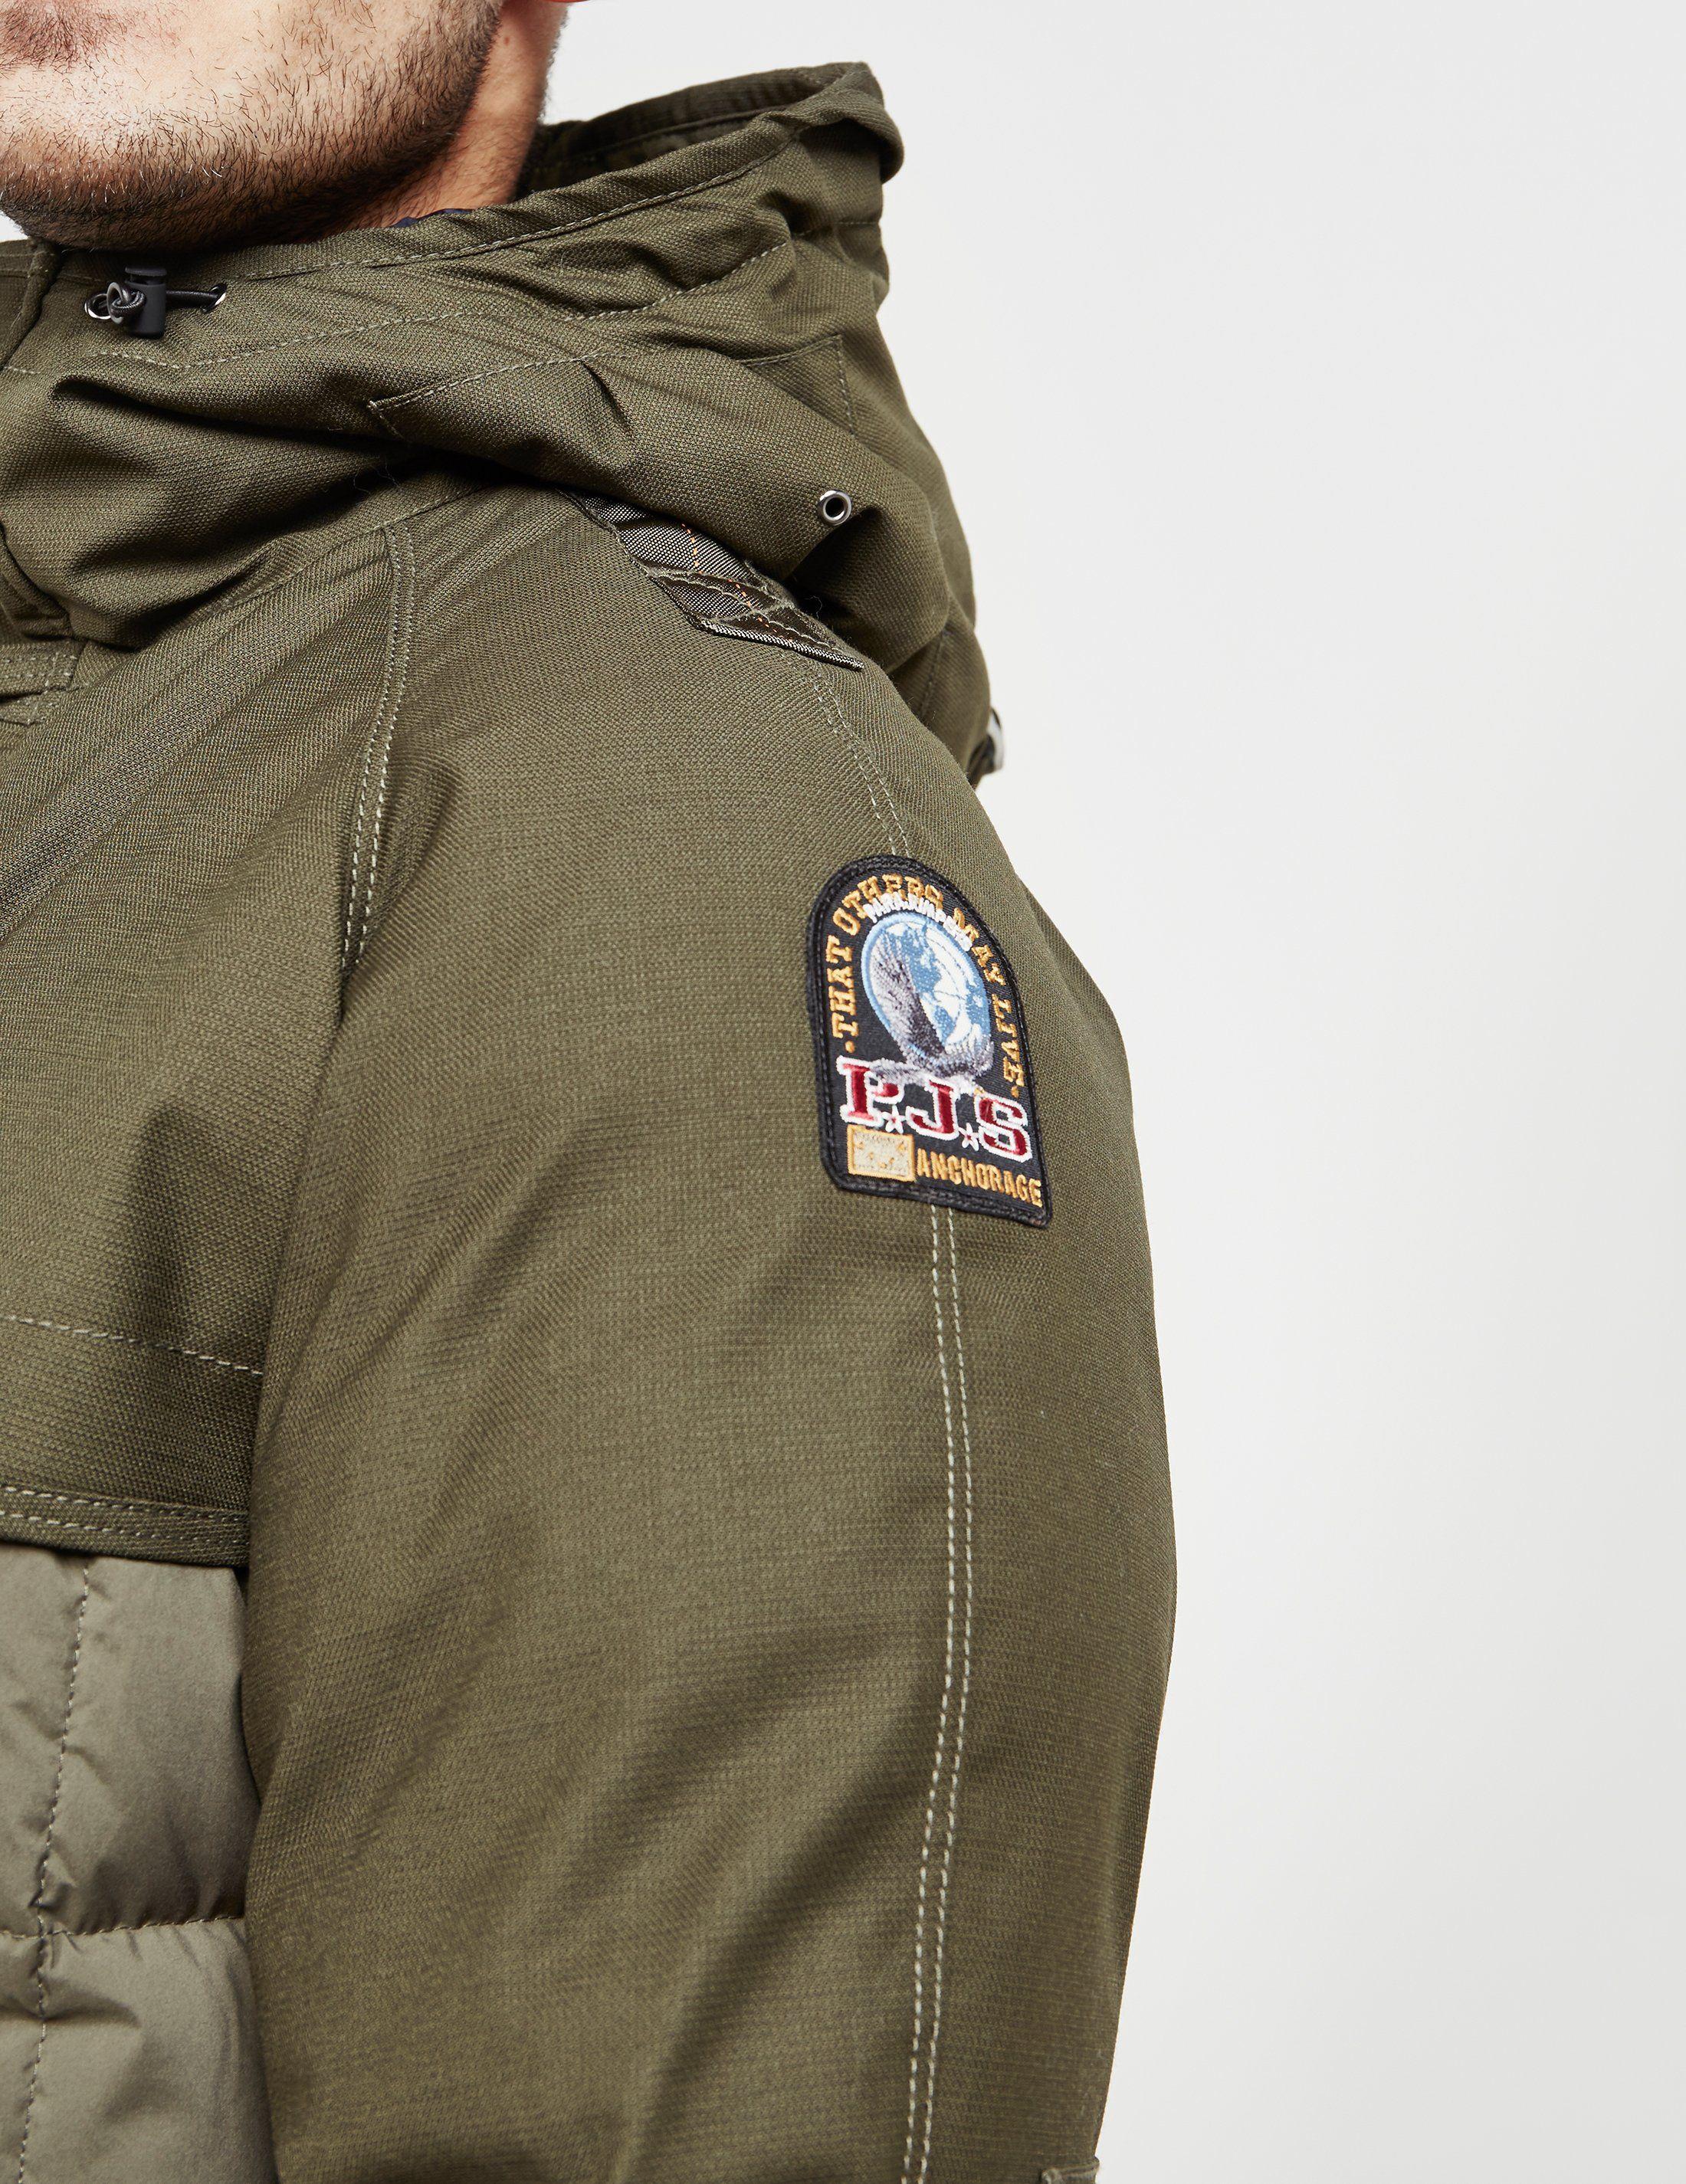 Parajumpers Freddy Heritage Parka Jacket - Online Exclusive